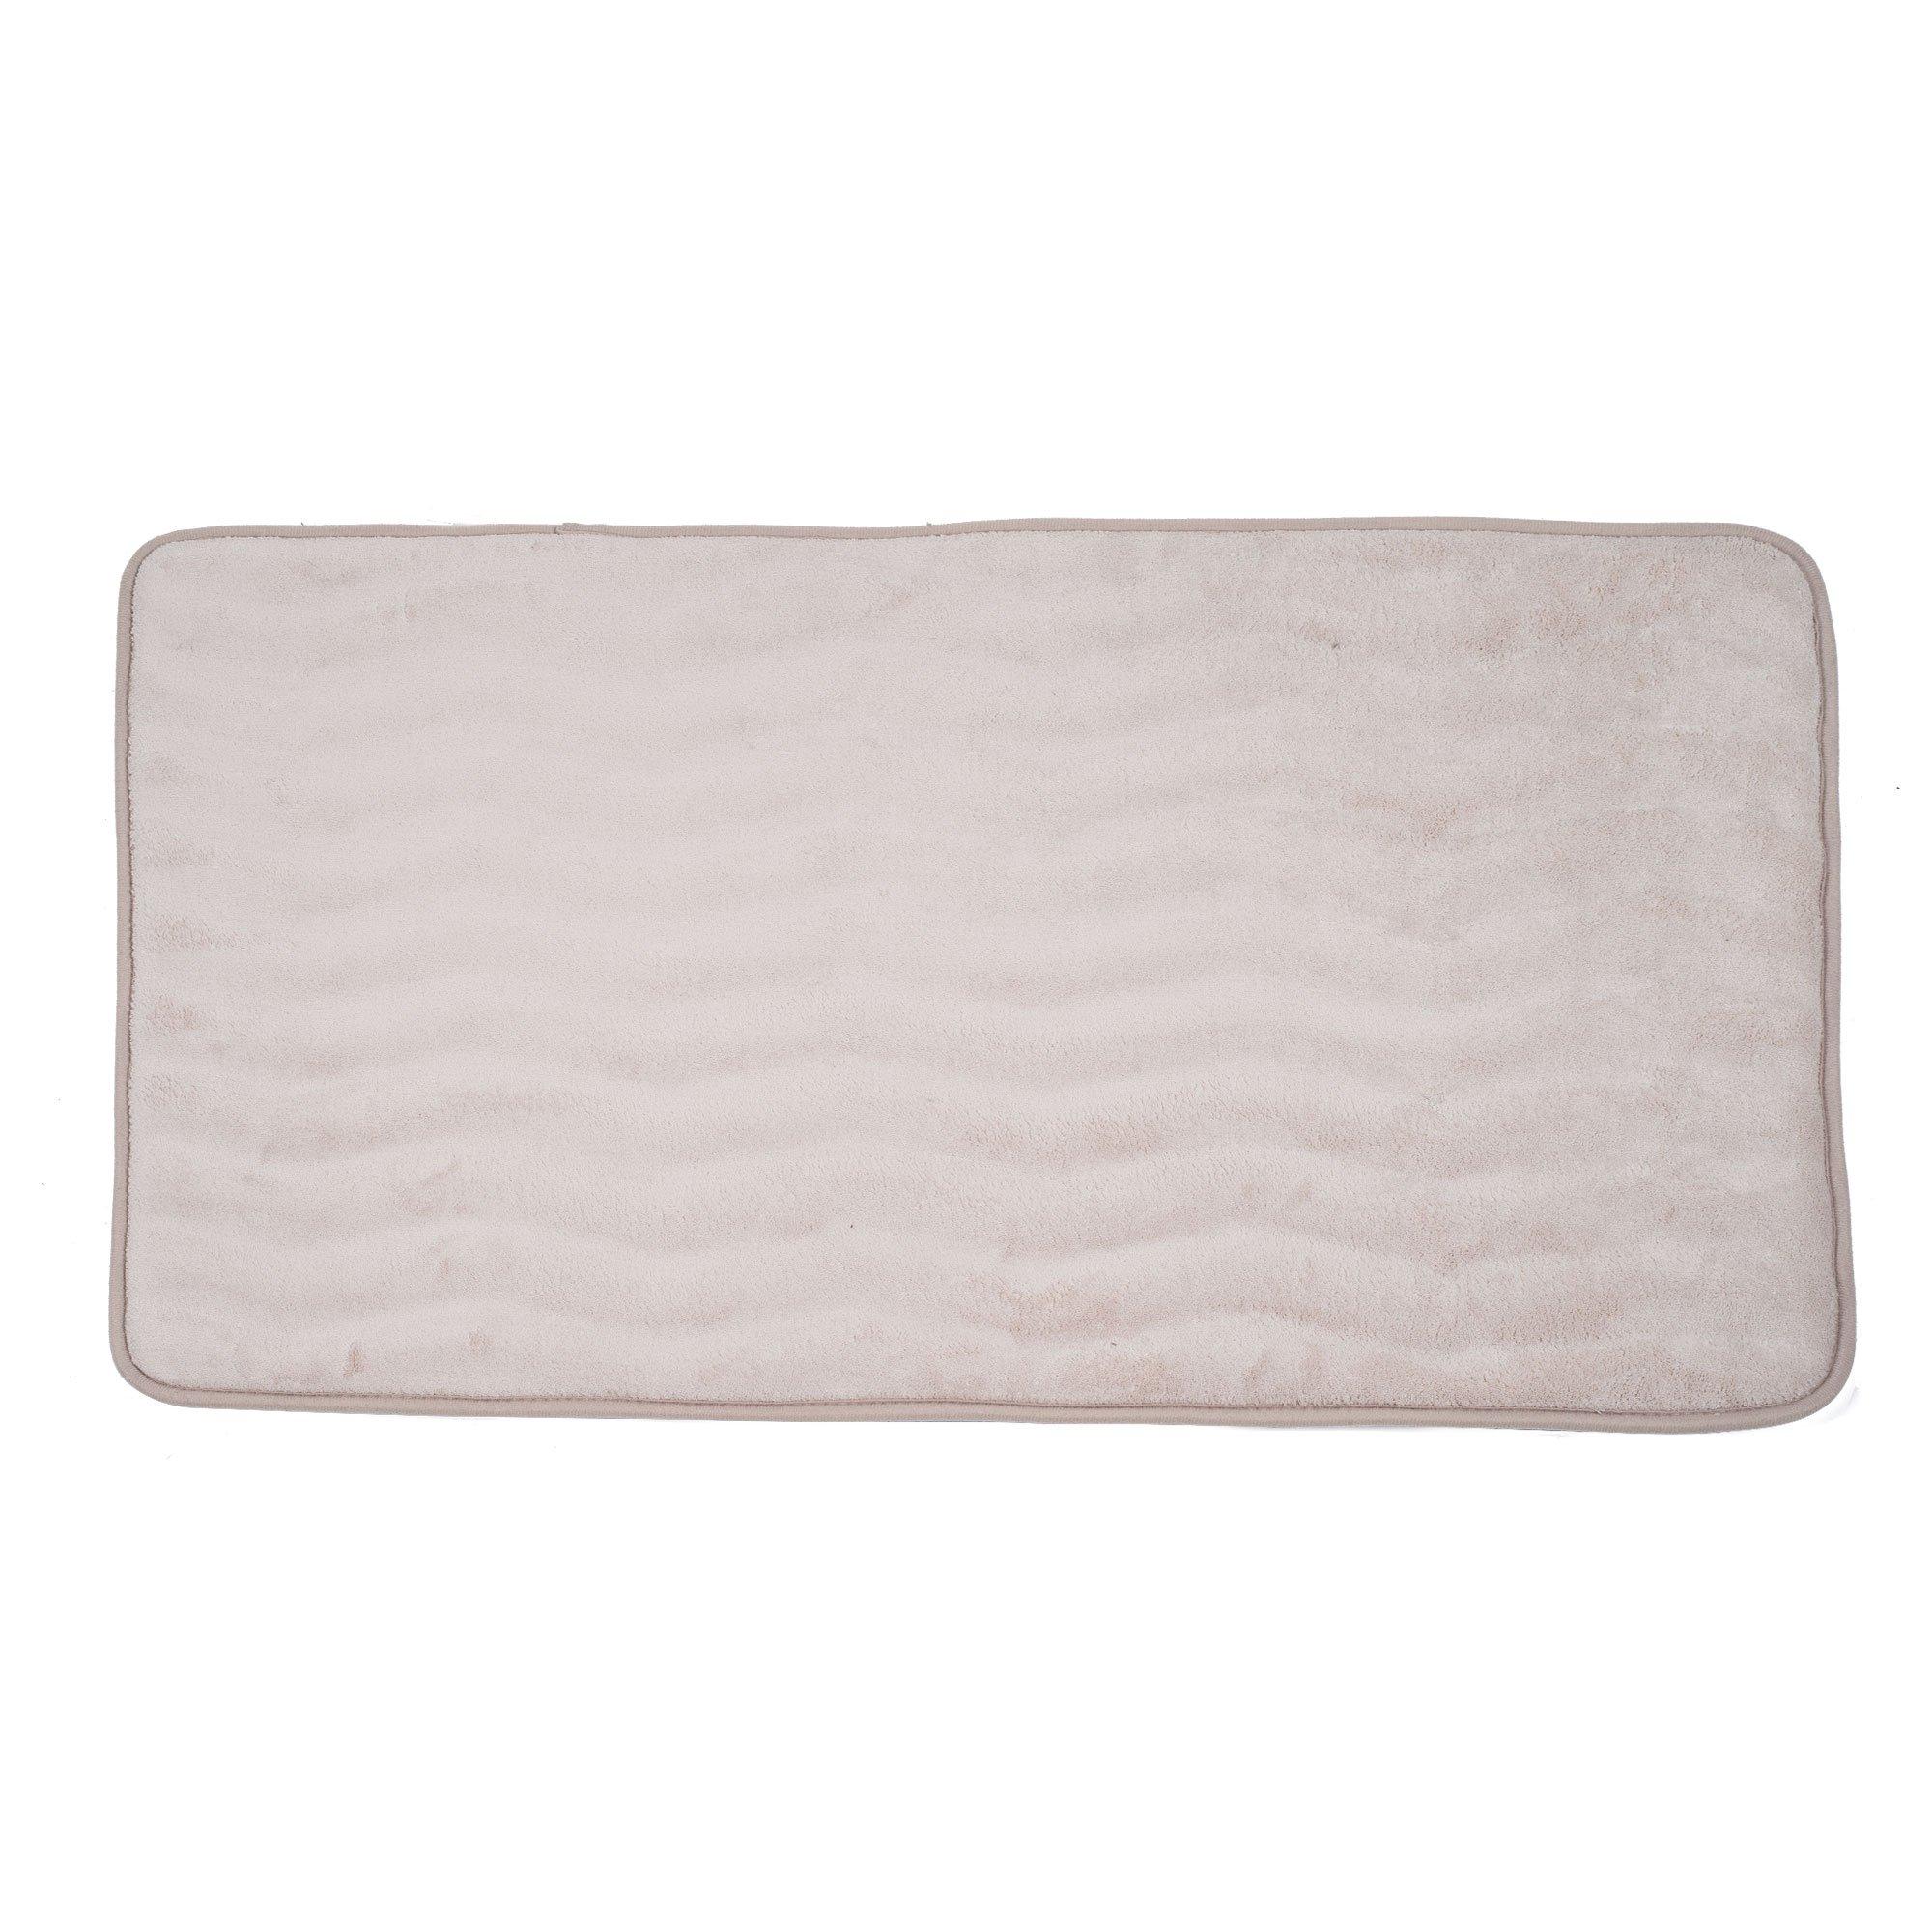 Lavish Home Memory Foam 24 by 60-Inch Bath Mat, Ivory, X-Long